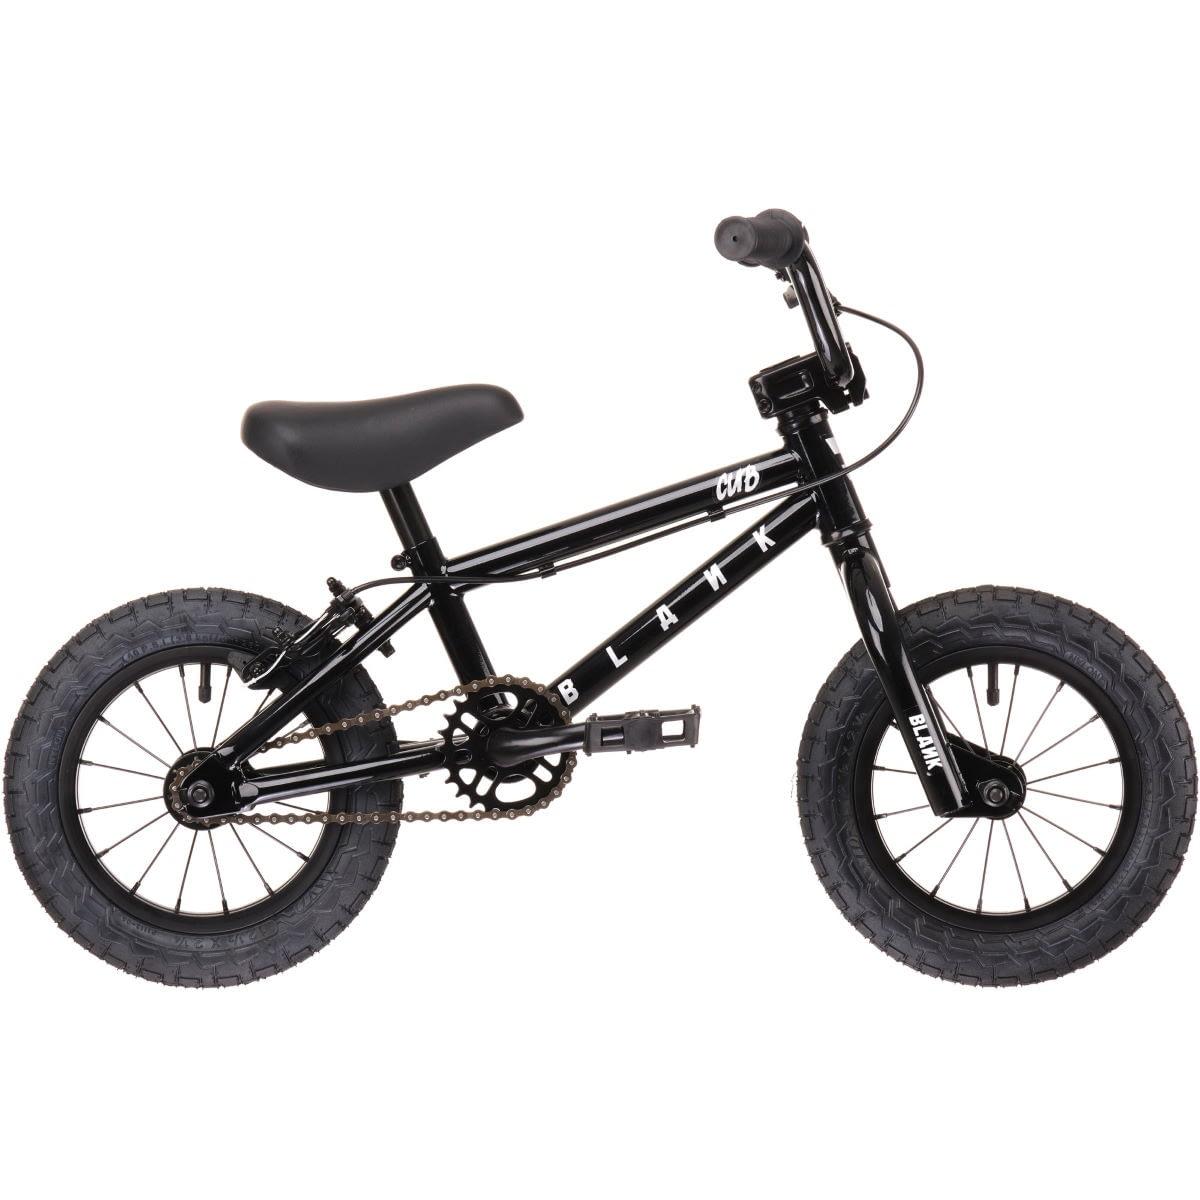 Blank Cub Kids BMX Bike Freestyle BMX Bikes